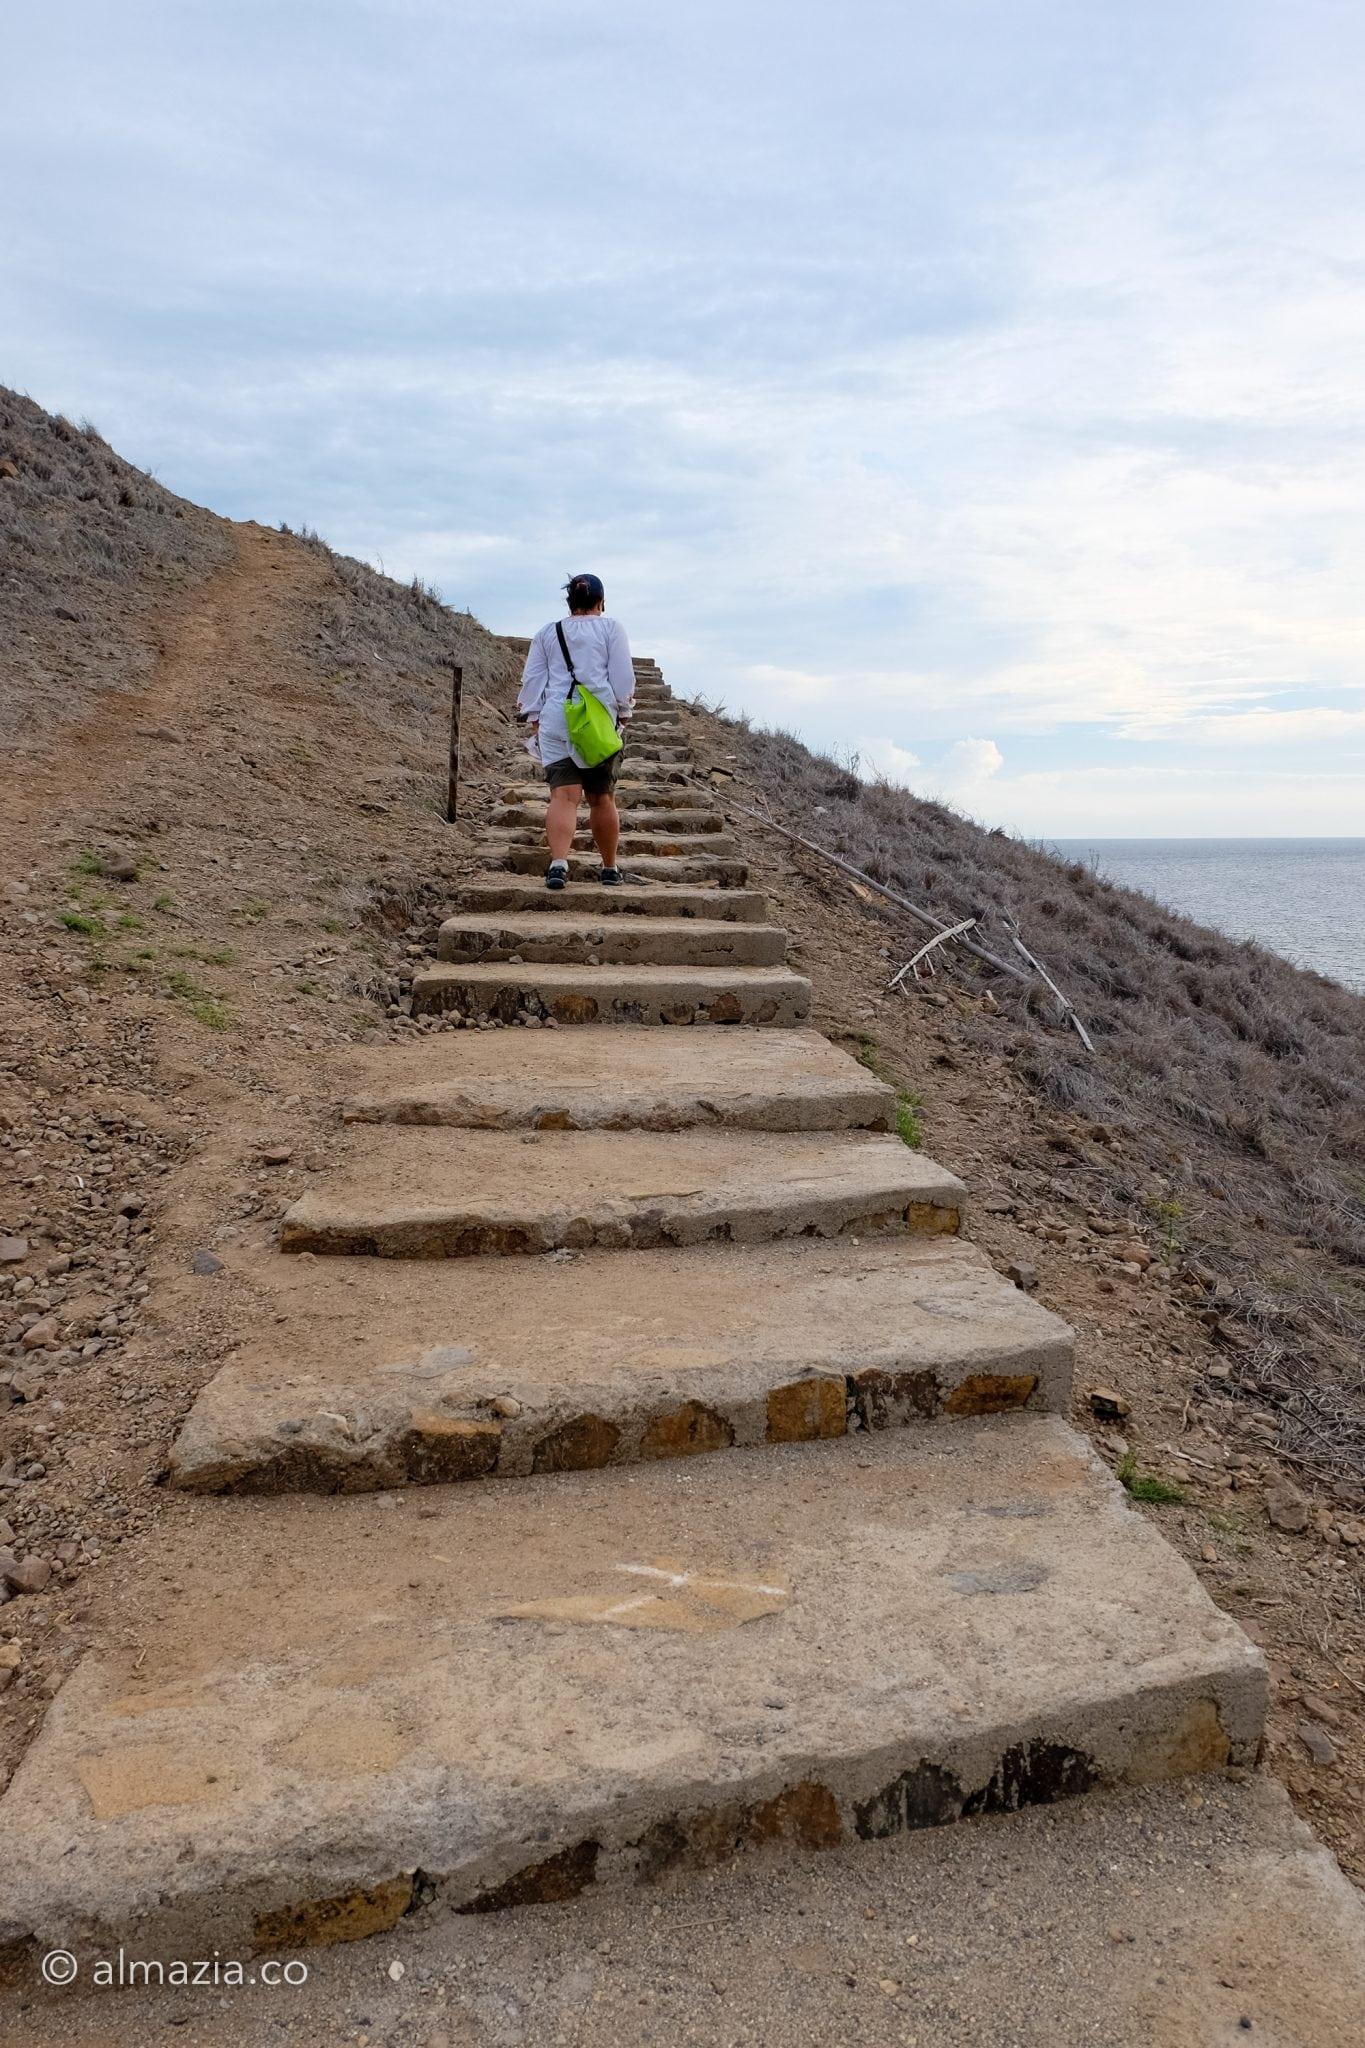 Perjalanan menaiki tangga kayu dilanjutkan dengan tangga batu